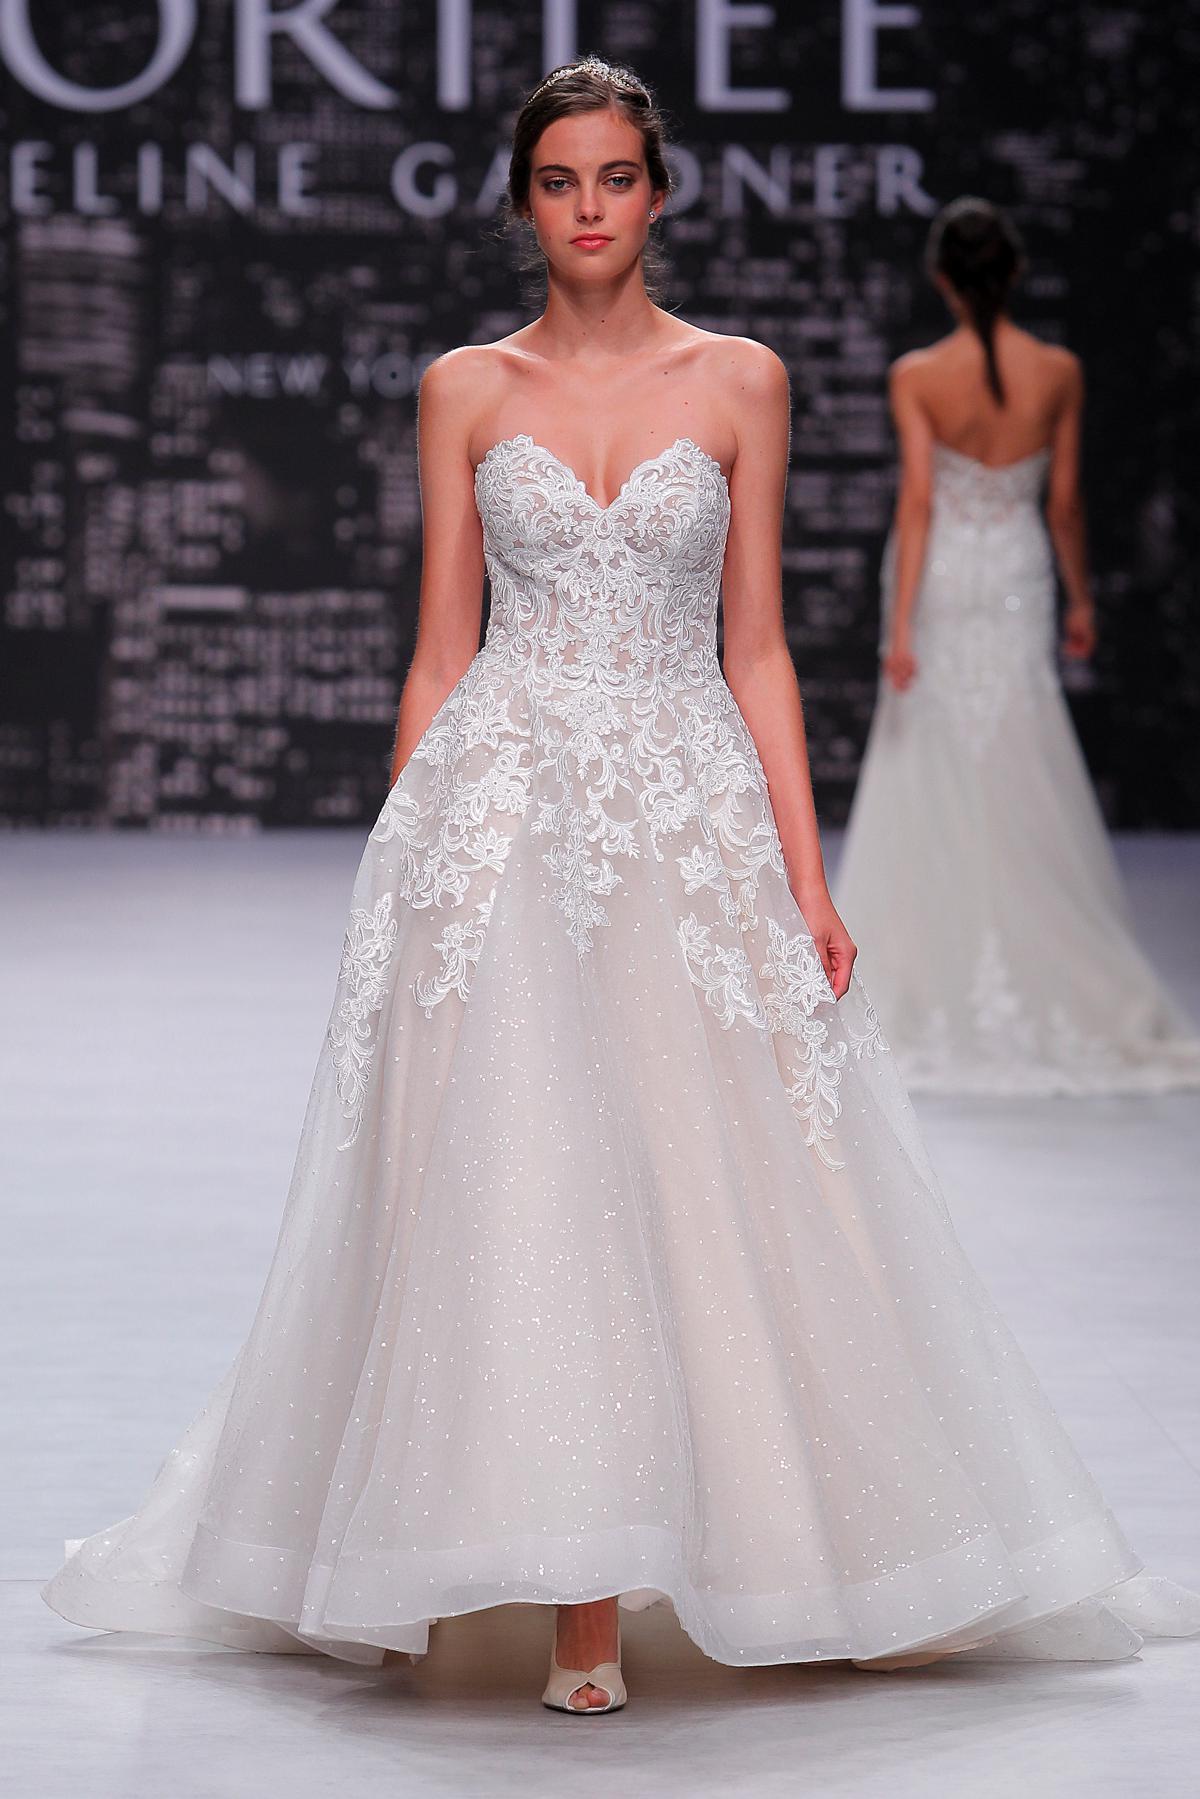 0de9d46cd0 Morilee 2020 collection launch! - Love Our Wedding